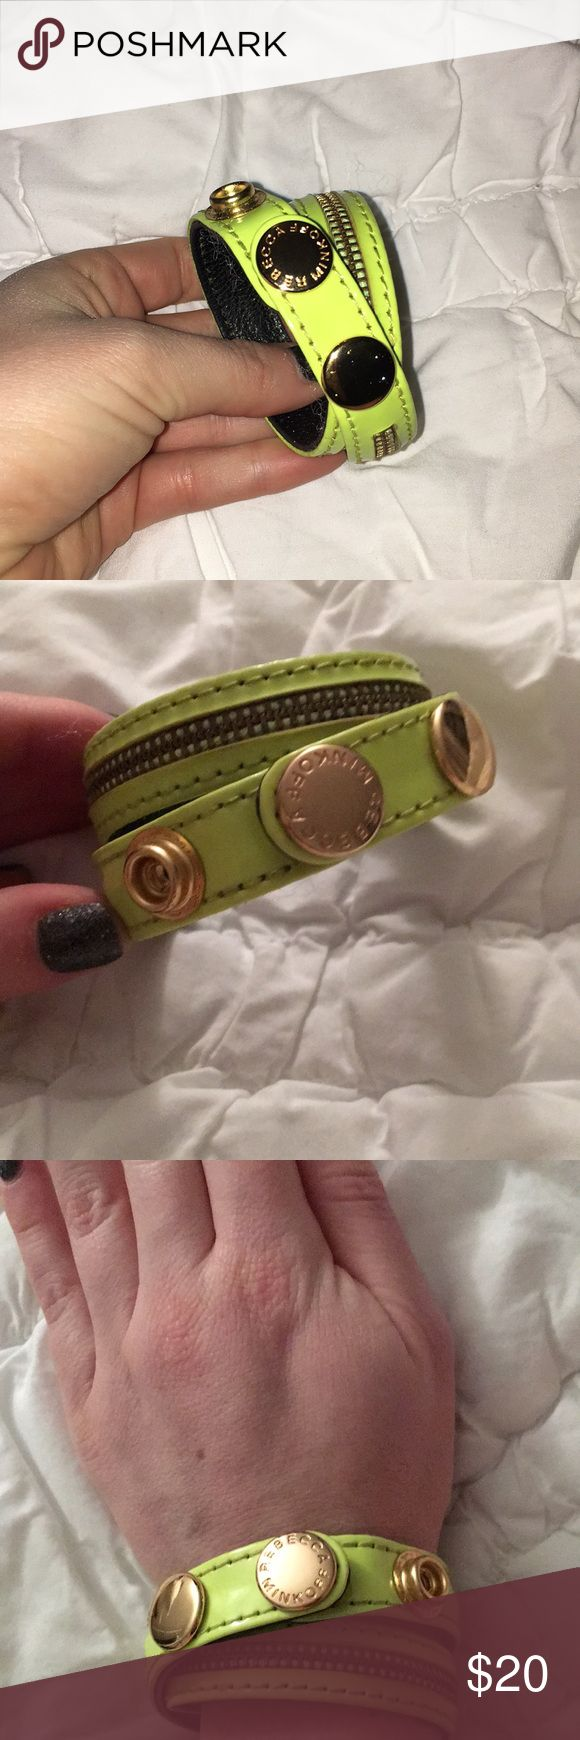 Rebecca Minkoff adjustable neon bracelet Super fun Neon green zipper bracelet with gold hardware. Adjustable. Rebecca Minkoff Jewelry Bracelets